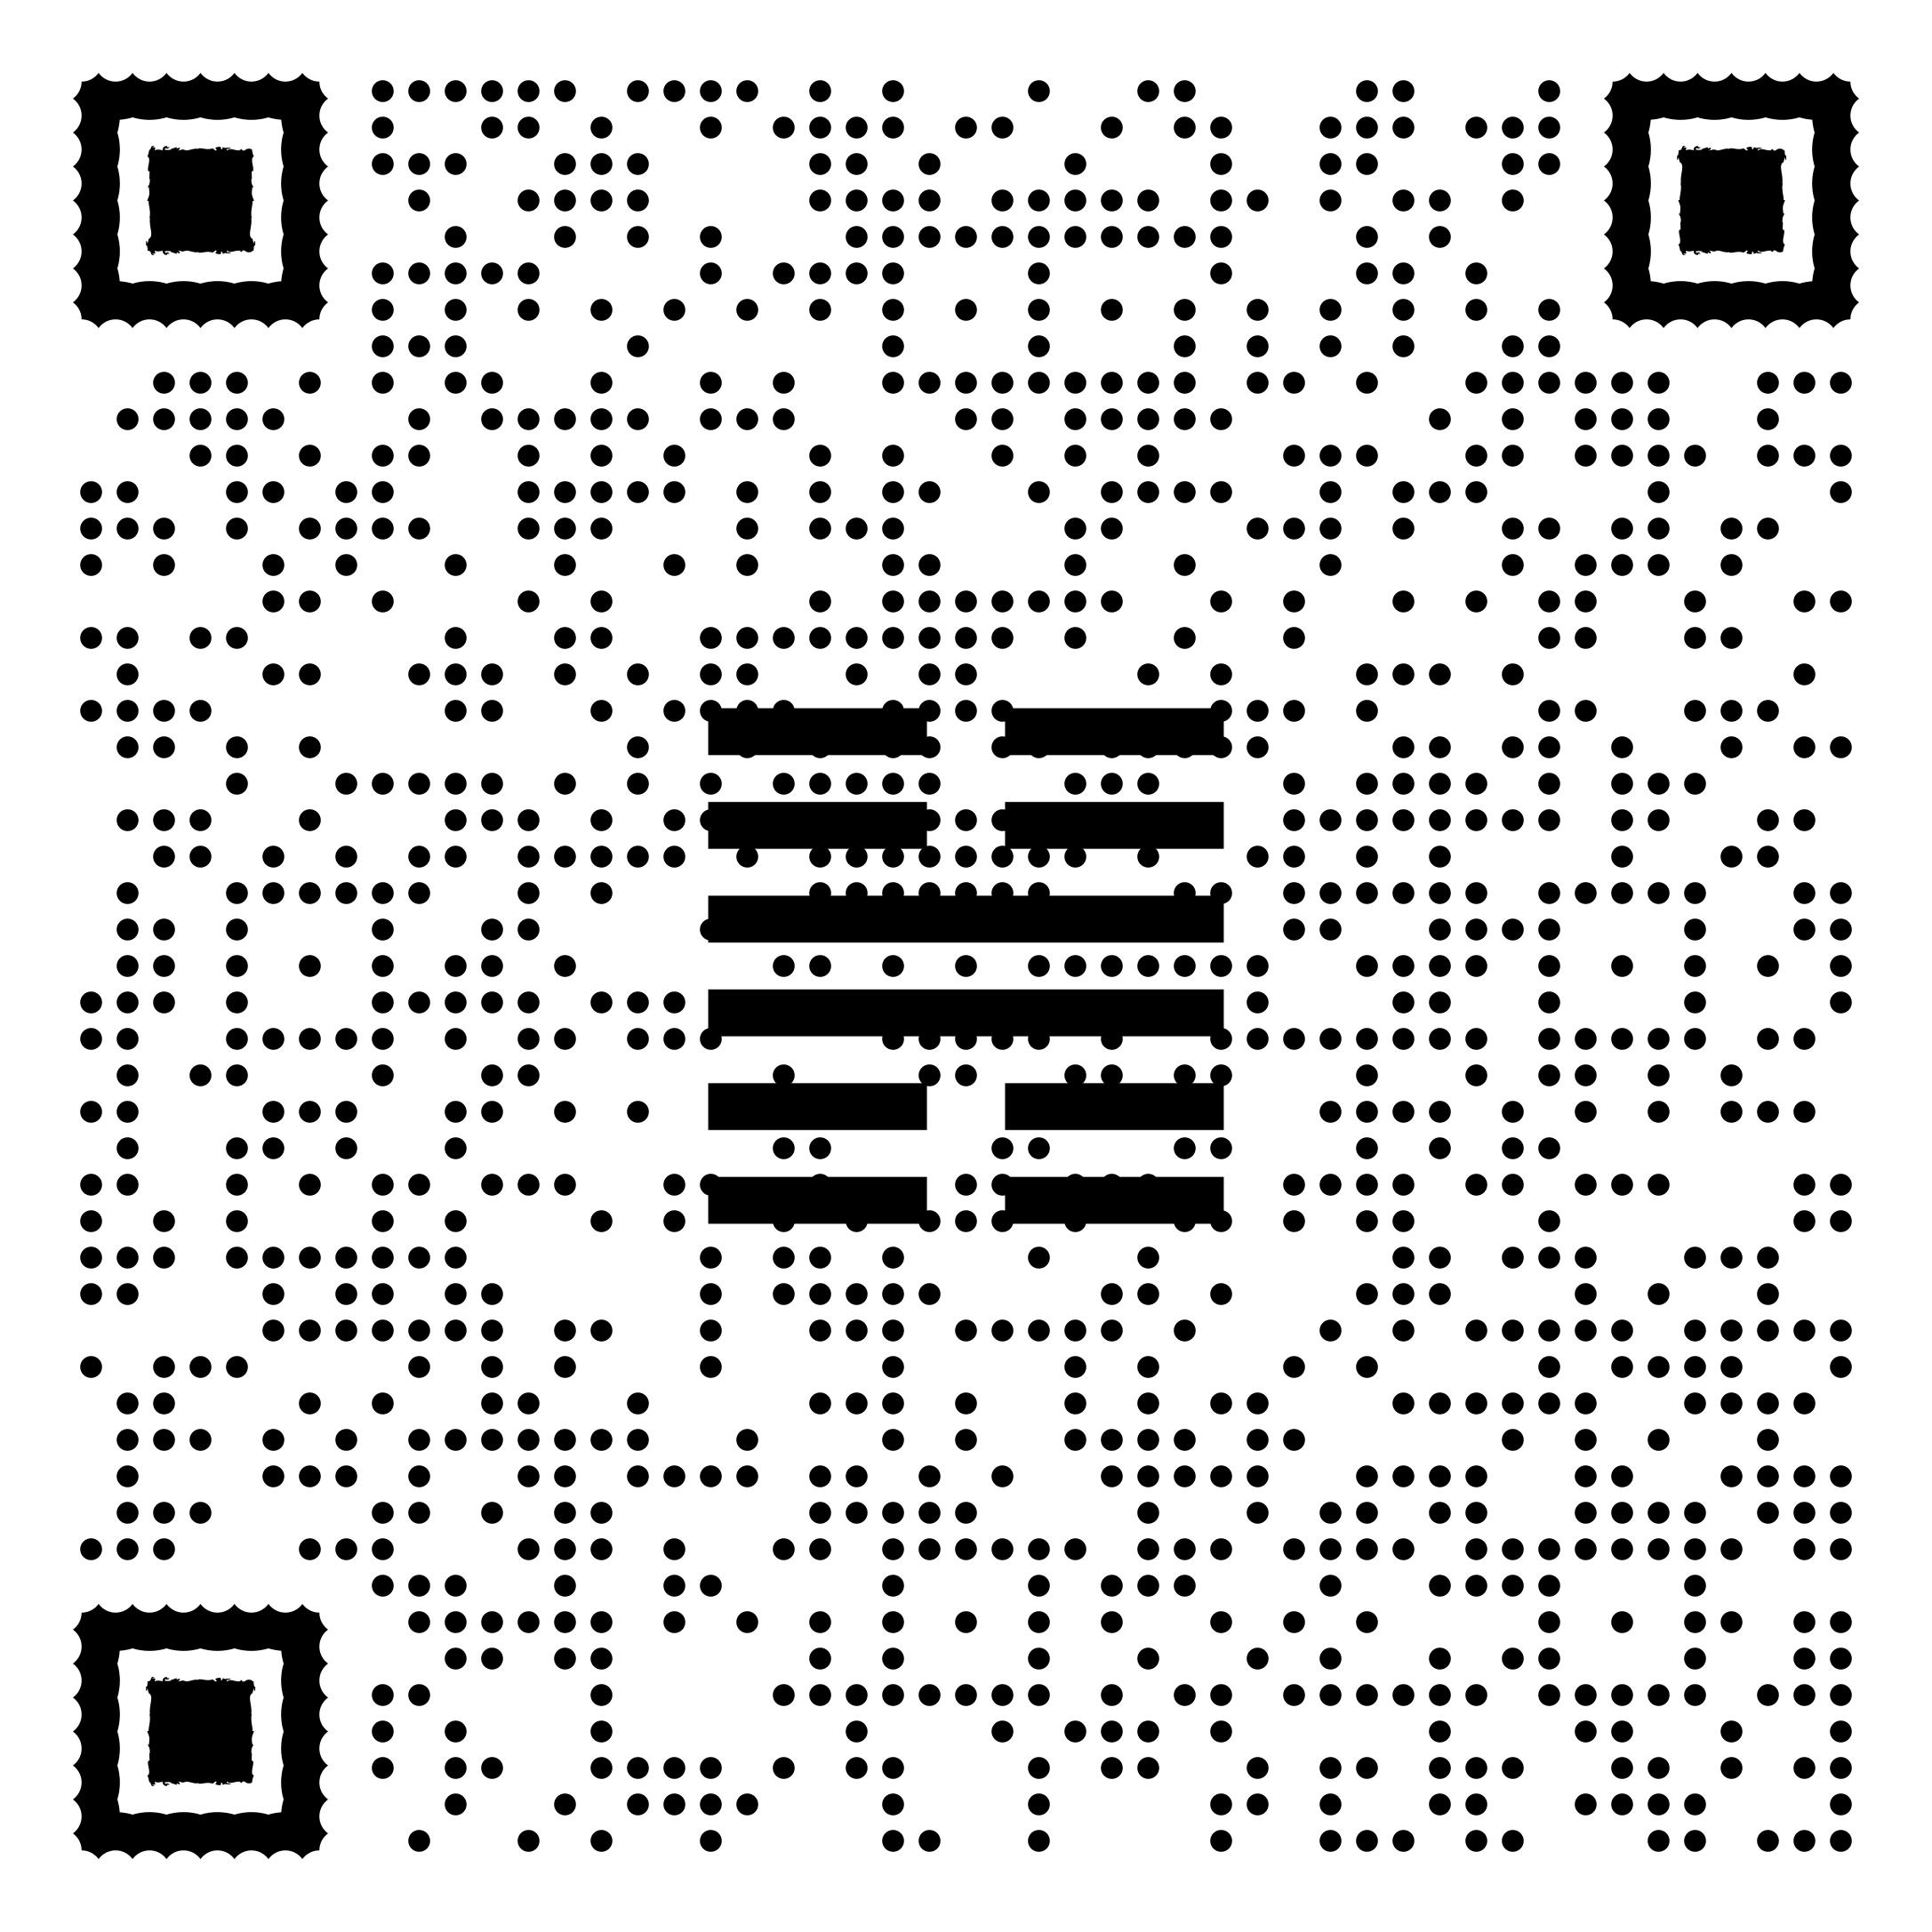 qr-code-62.png